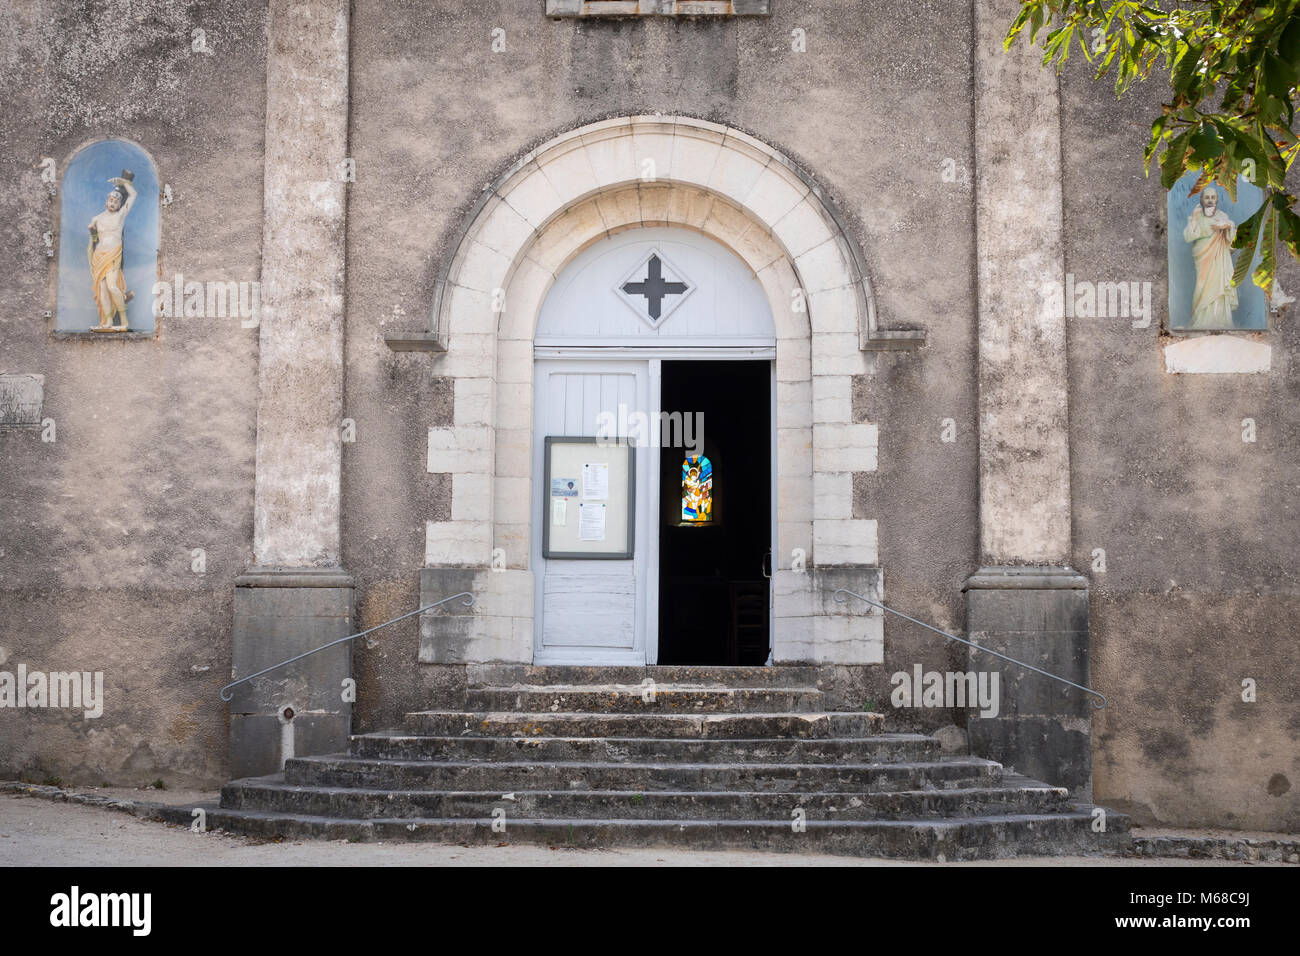 St Thome Privas Ardèche Auvergne-Rhône-Alpes France - Stock Image